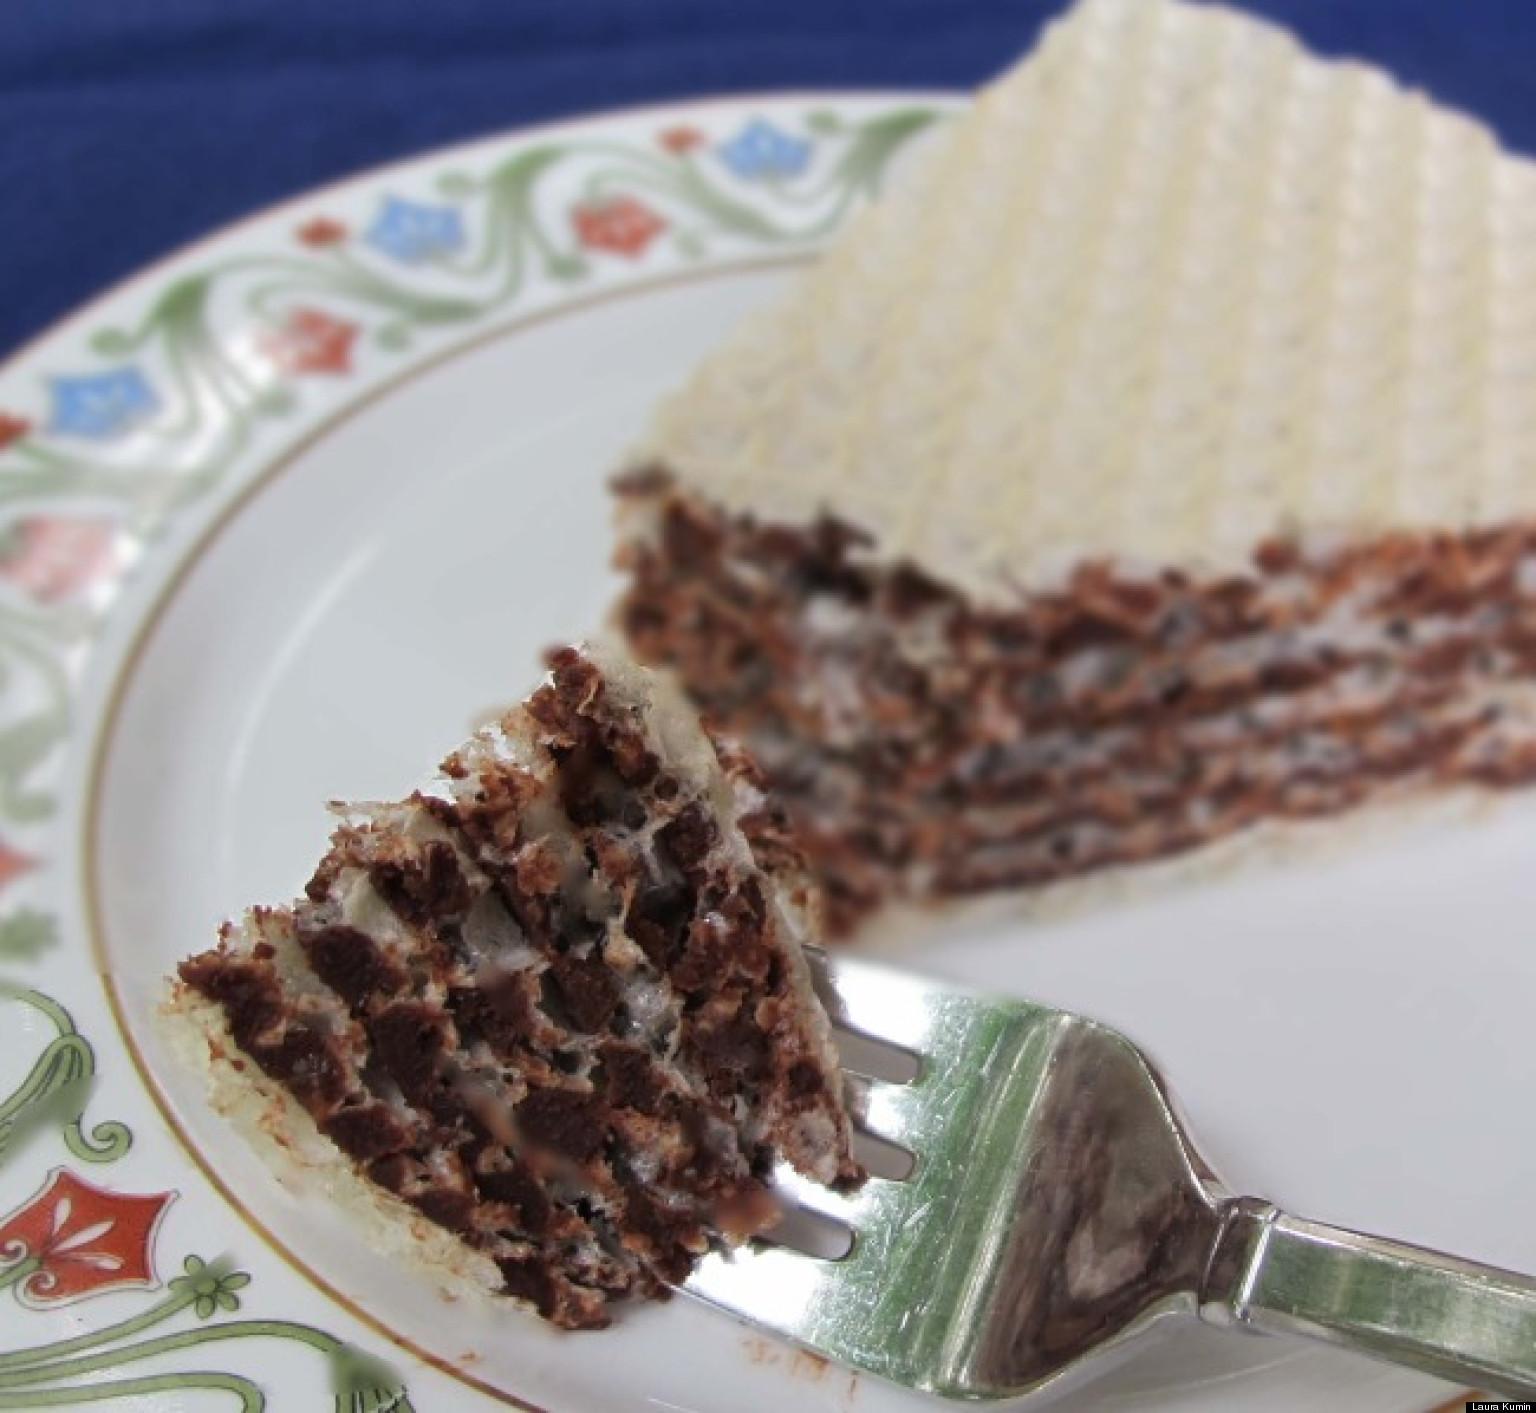 Russian Chocolate Wafer Cake